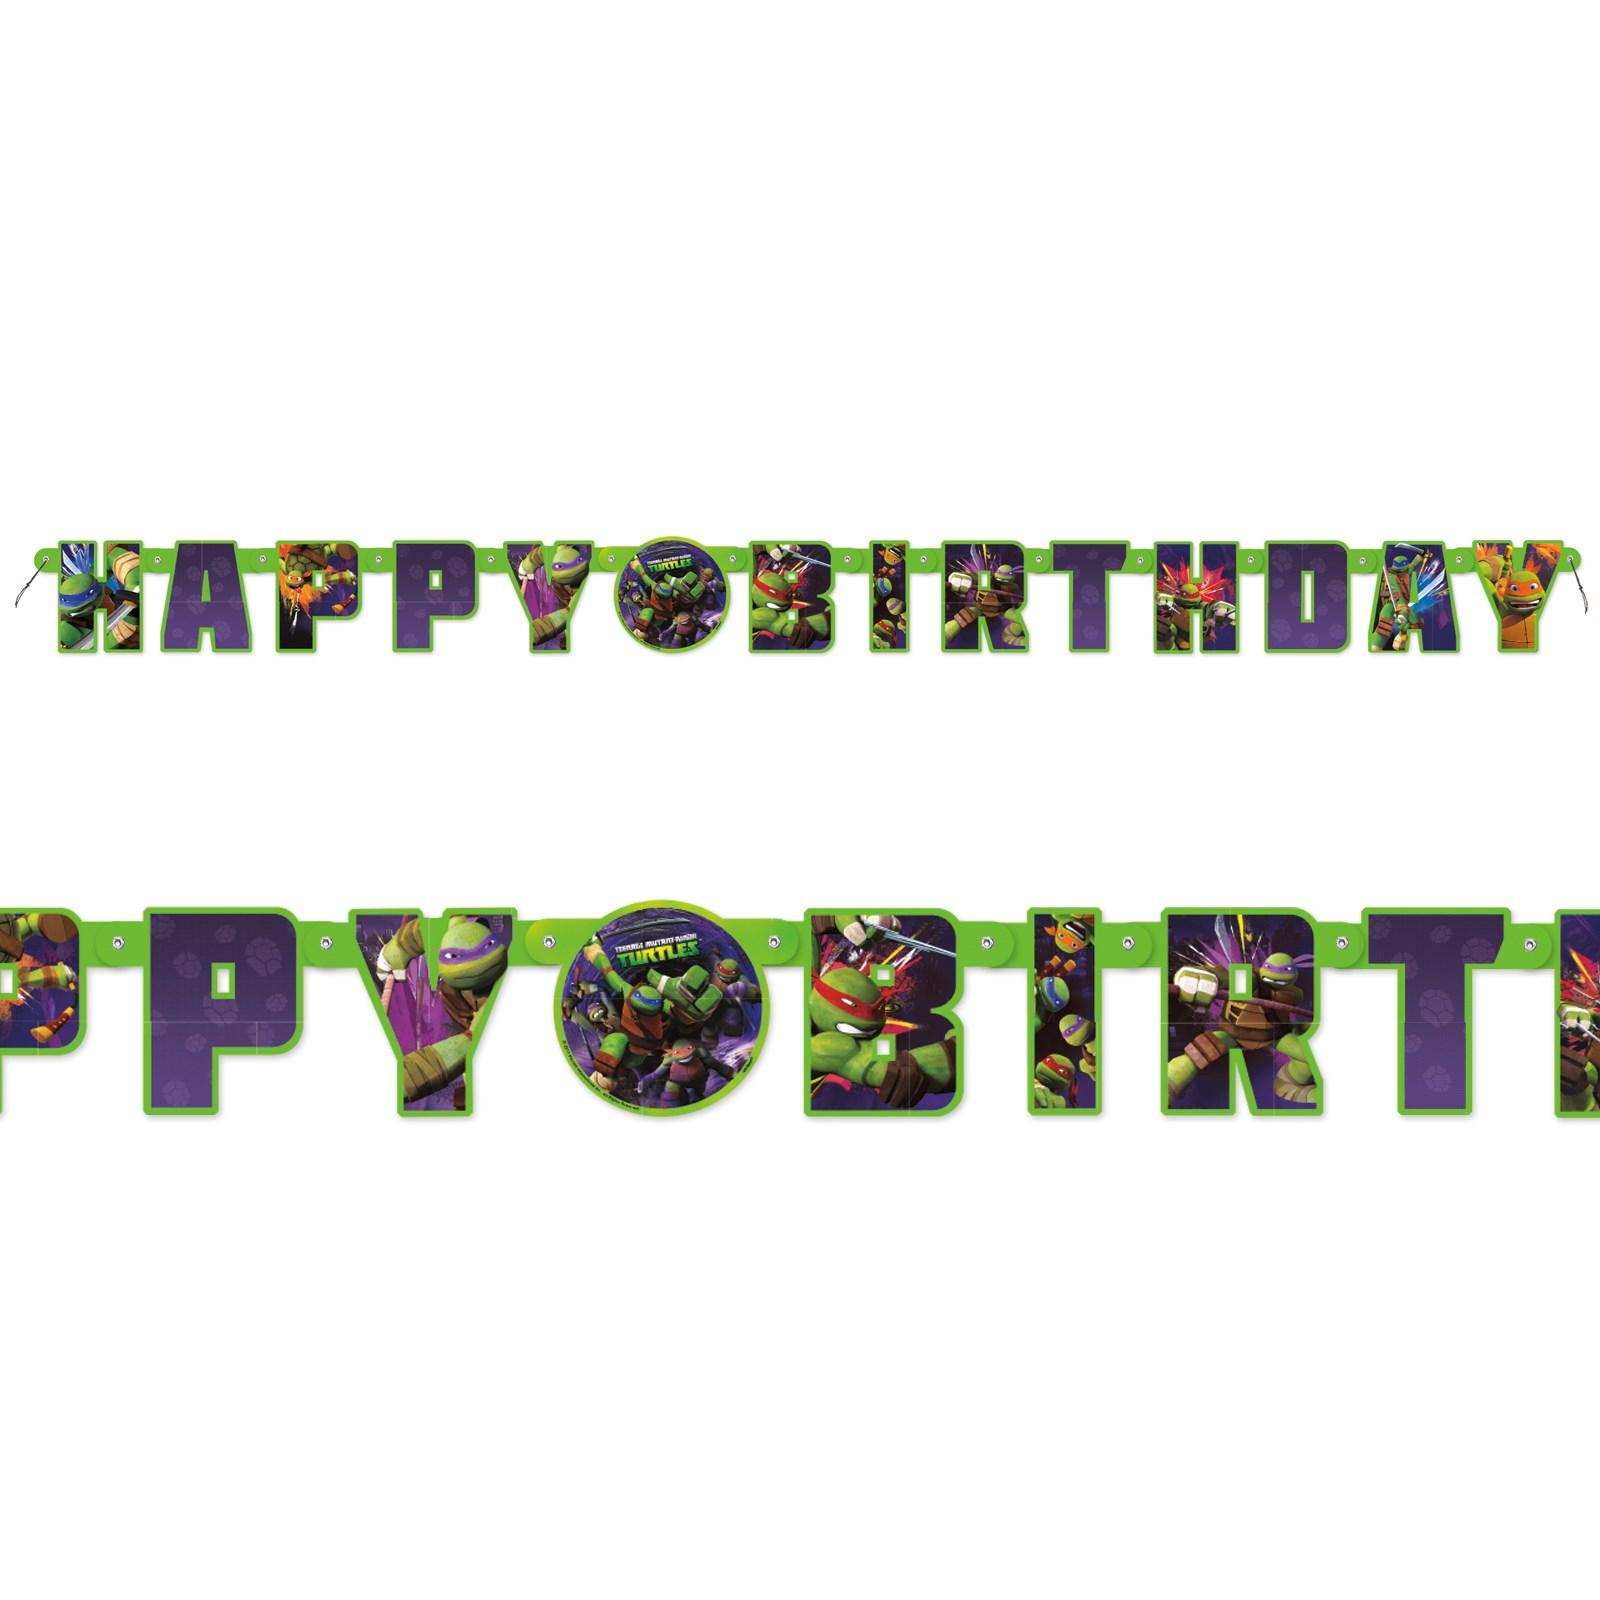 Nickelodeon Teenage Mutant Ninja Turtles Birthday Letter Banner